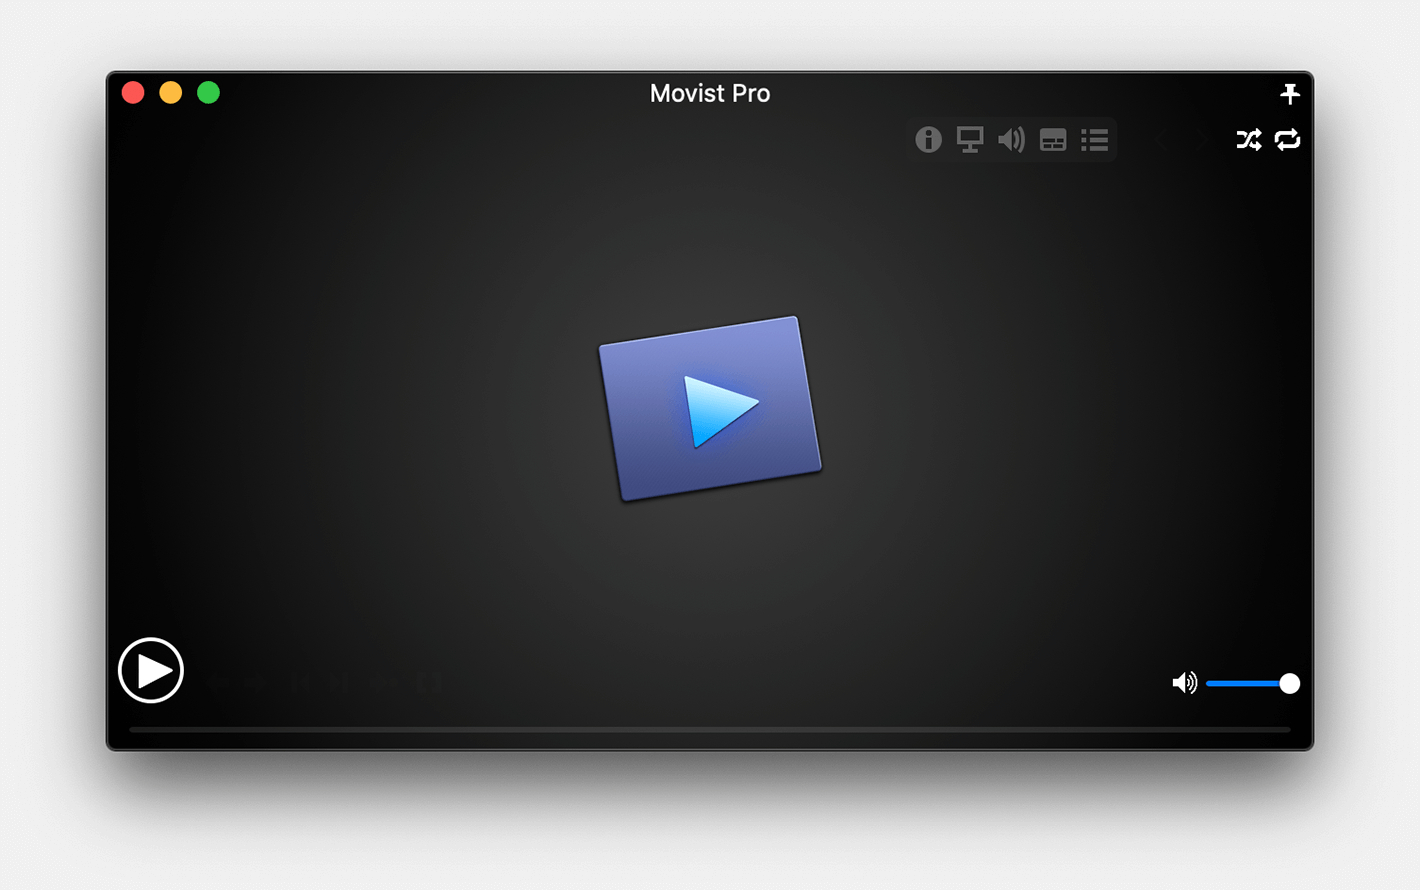 Movist Pro 2.2.19 功能强大的电影播放器-马克喵